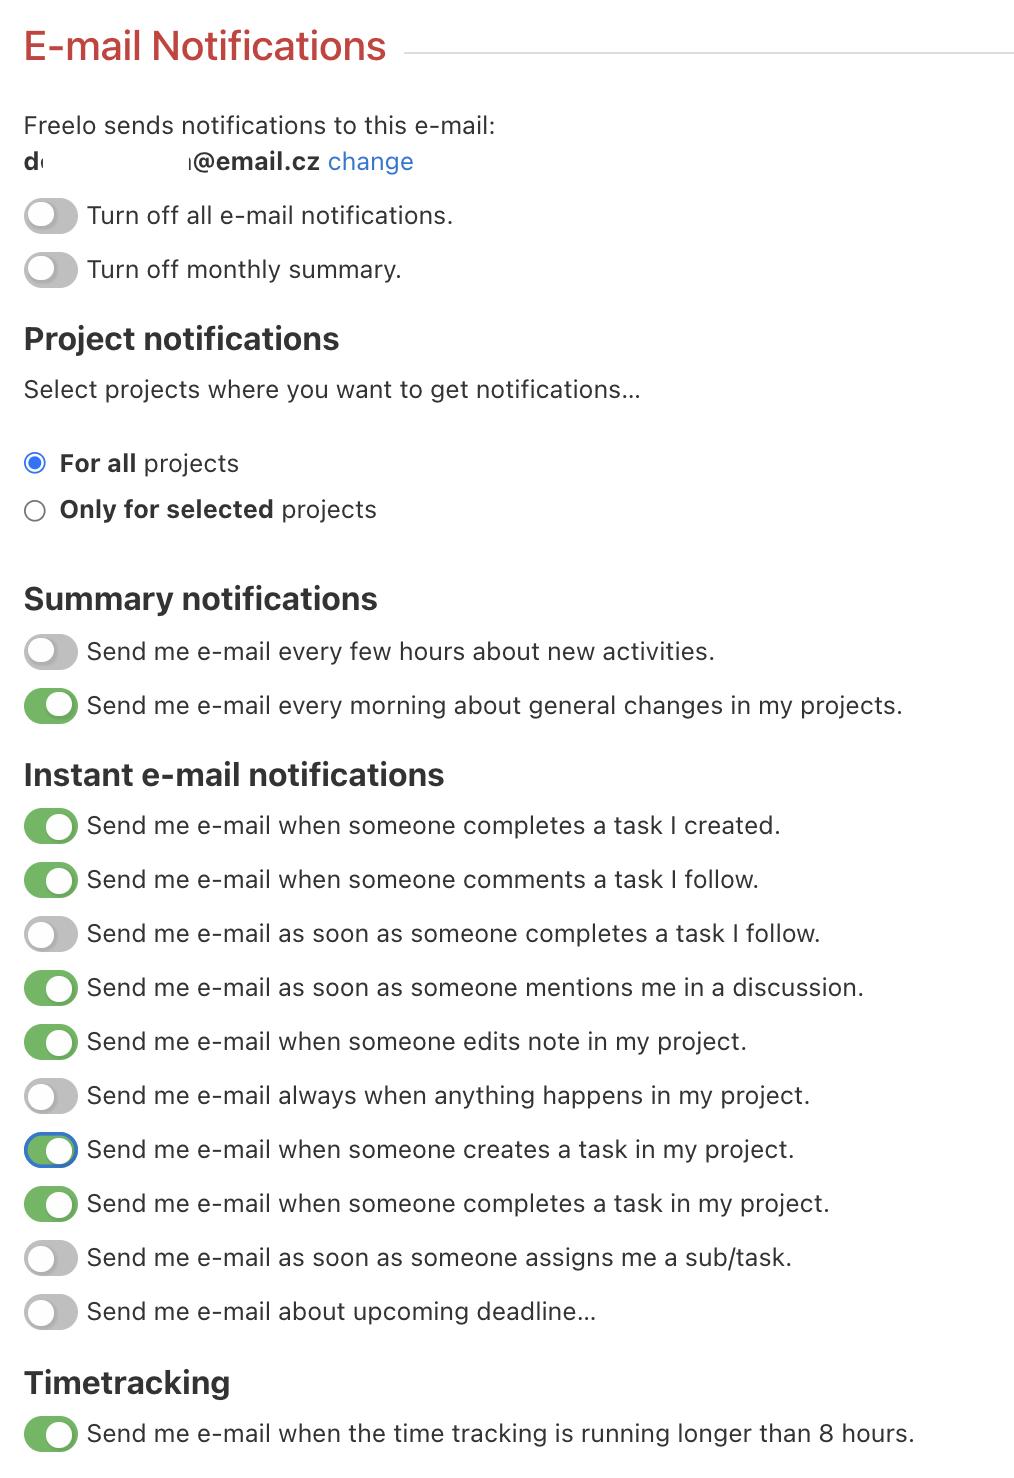 E-mail notification setup options.